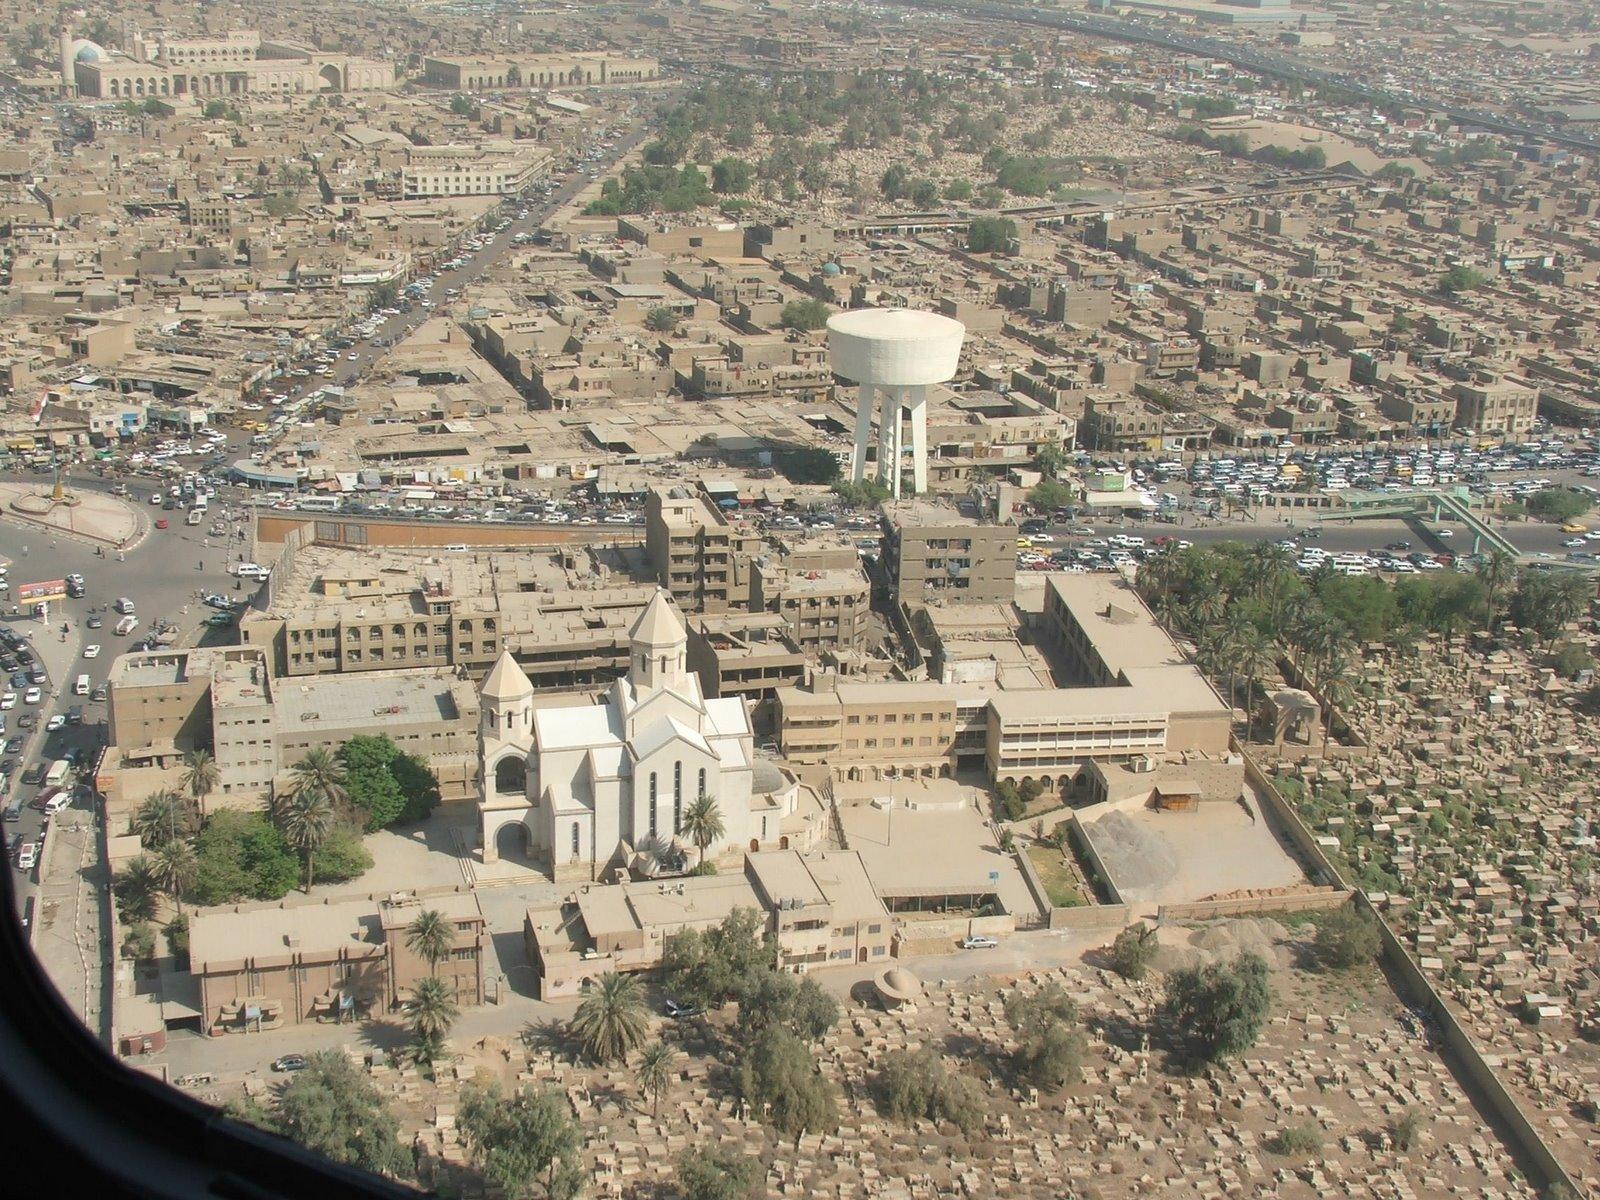 acf287ef8 اهدي هذه الصورة لكاتدرائية القديس غريغور المنوّر في بغداد